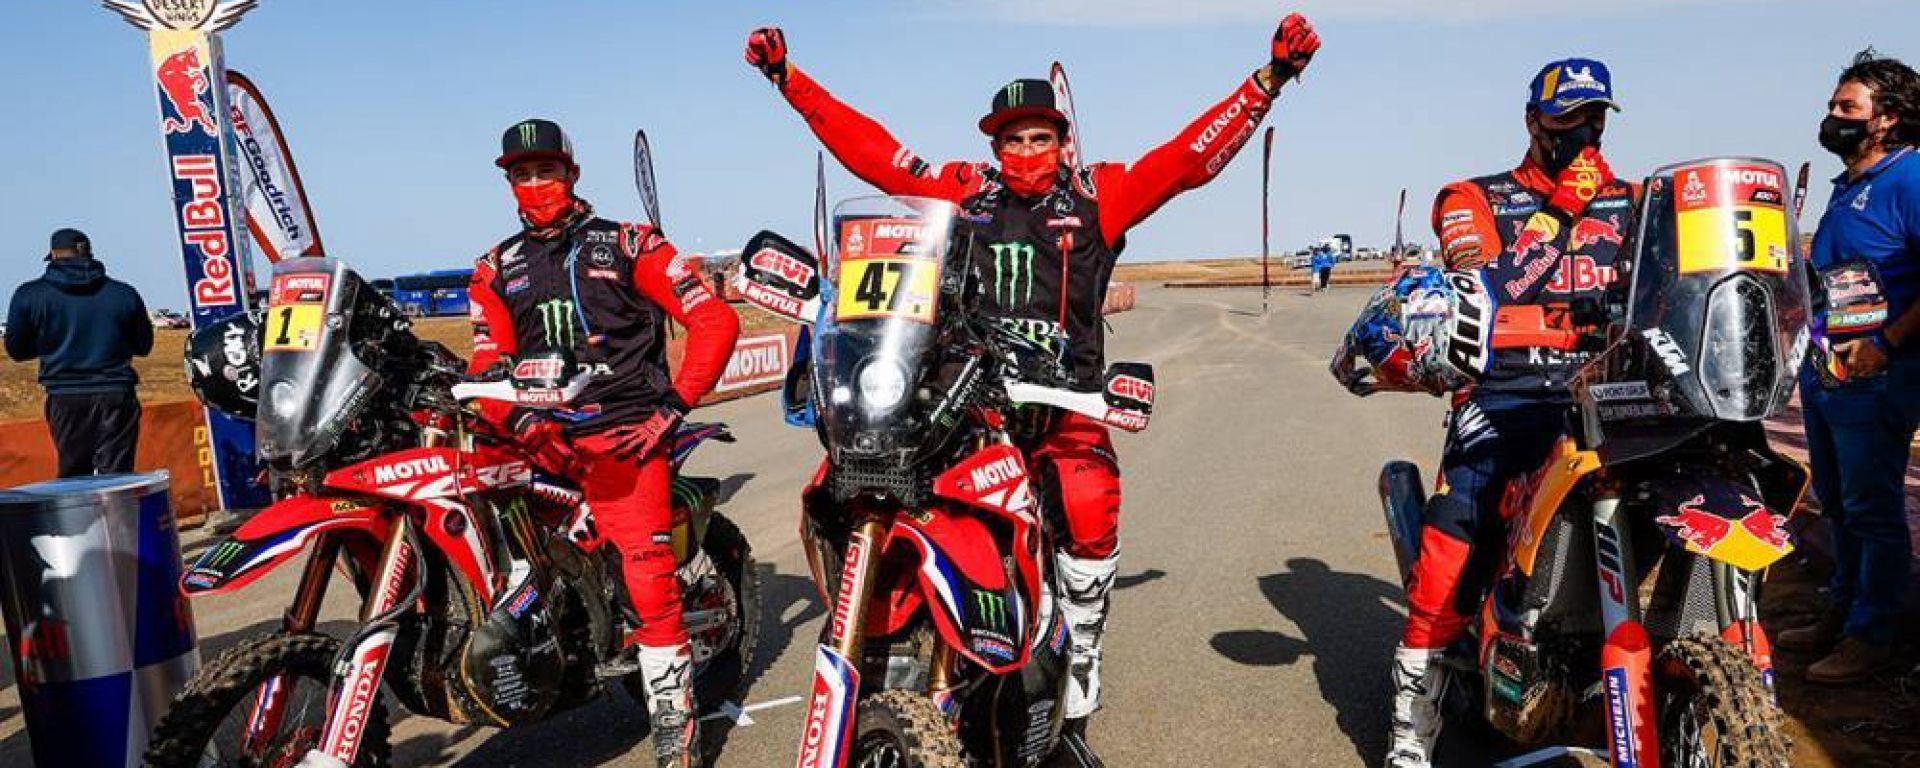 Dakar Moto 2021: il podio finale con Ricky Brabec (Honda), Kevin Benavides (Honda) e Sam Sunderland (KTM)